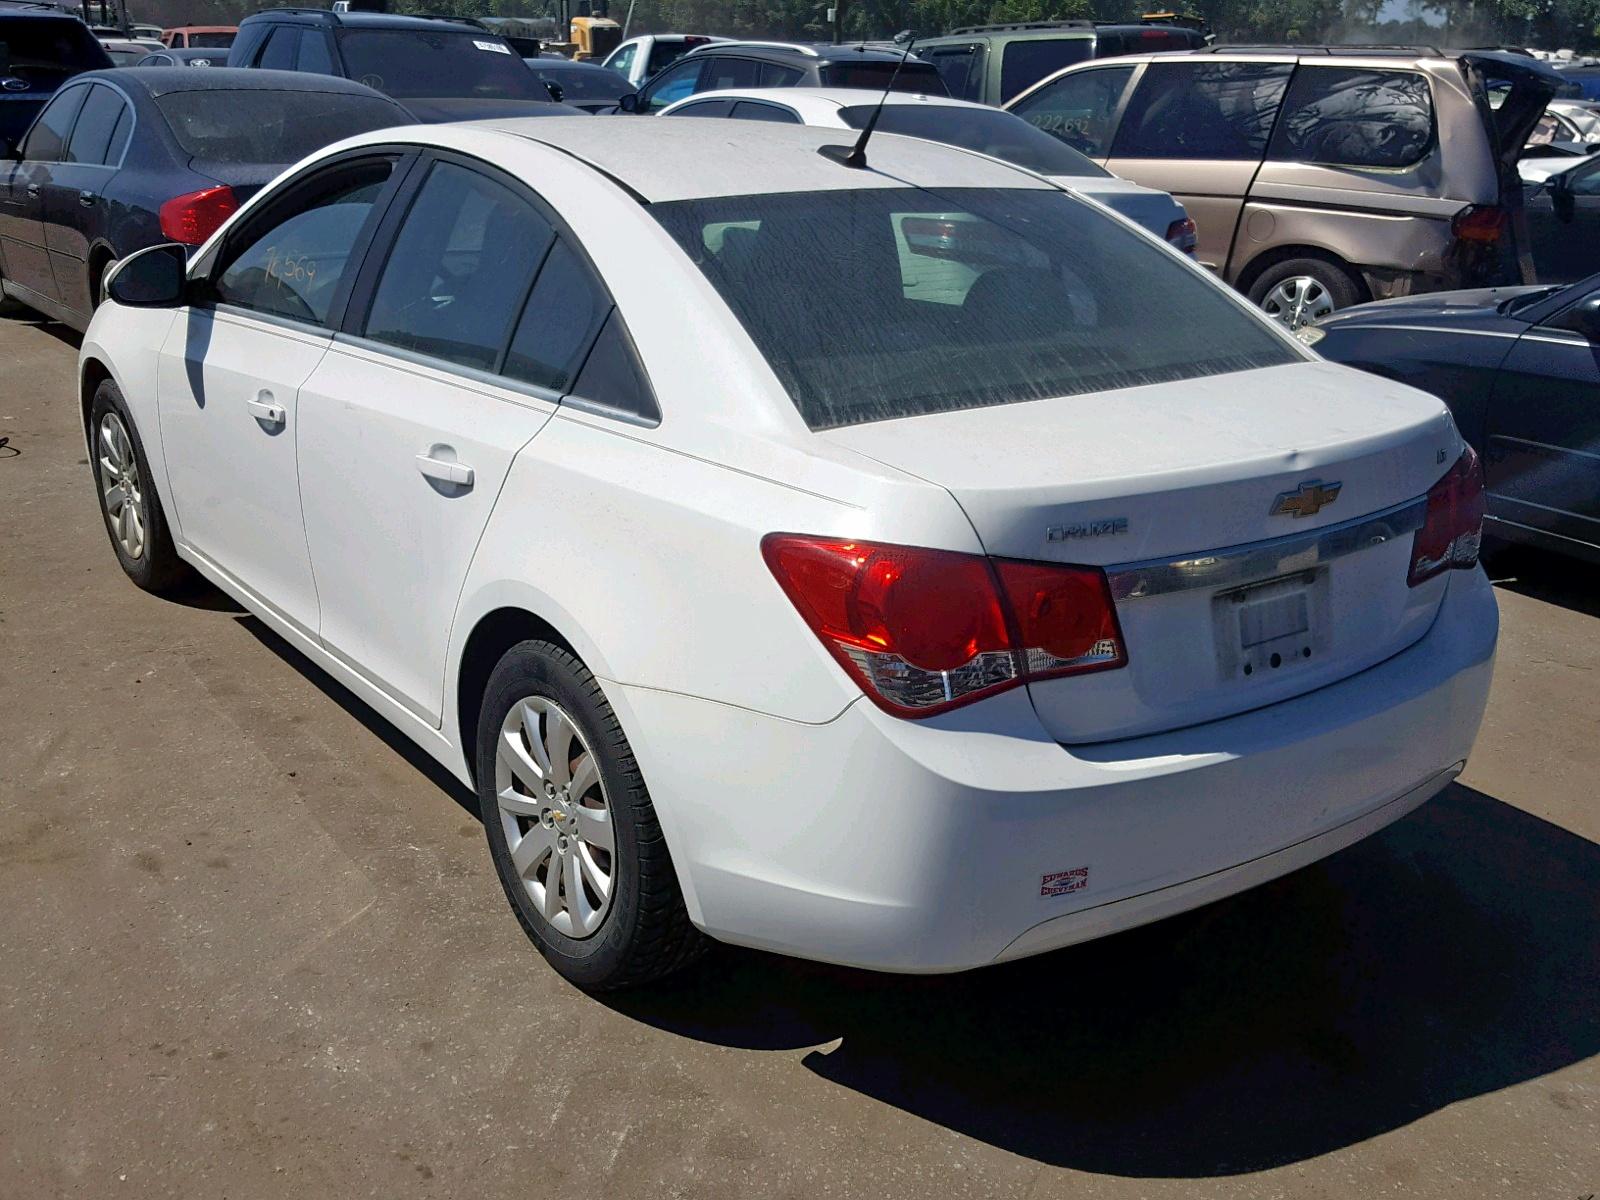 1G1PF5S9XB7293821 - 2011 Chevrolet Cruze Lt 1.4L [Angle] View